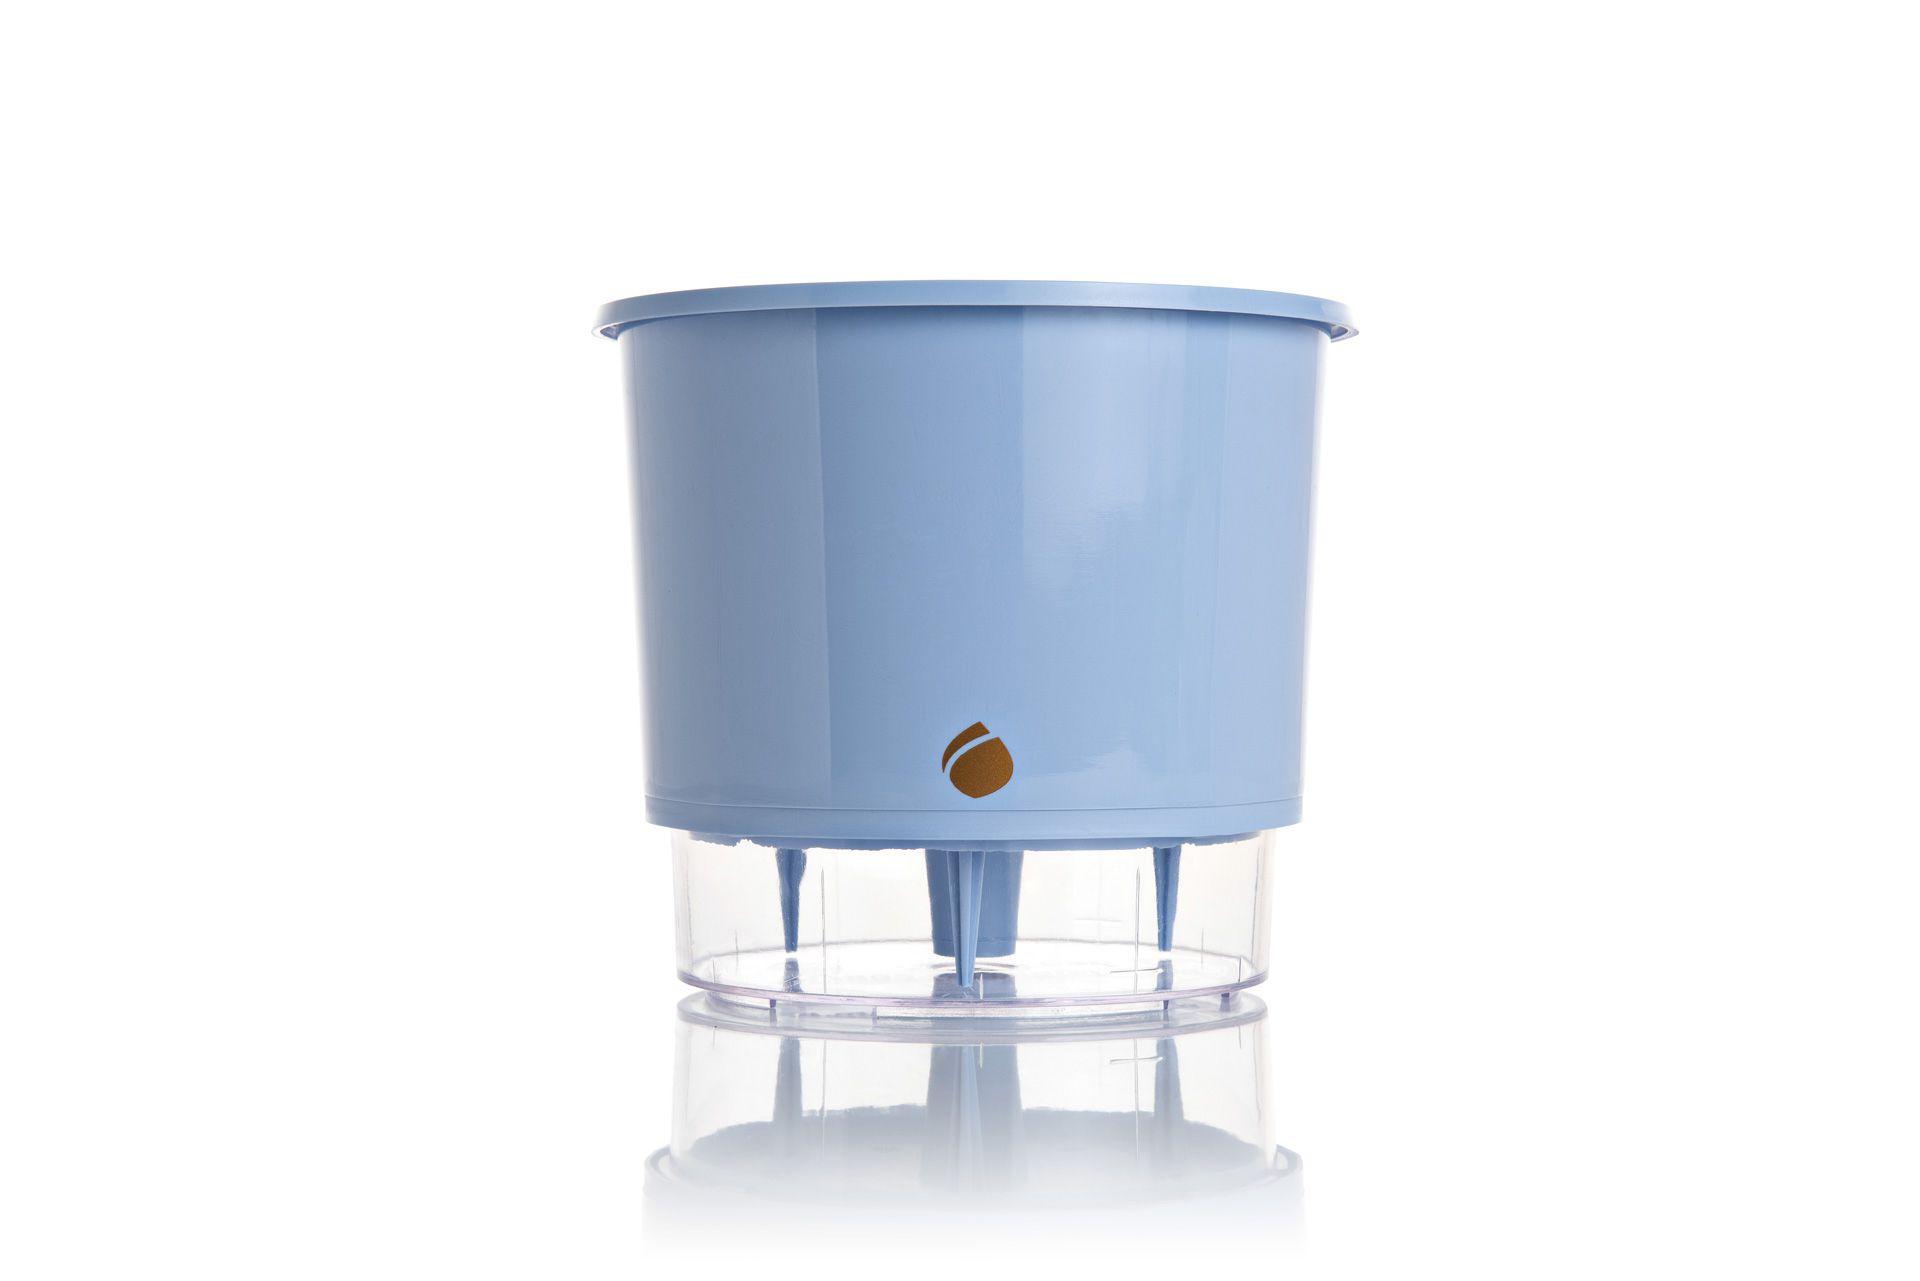 Vaso Autoirrigável 2 Azul Serenity Raiz